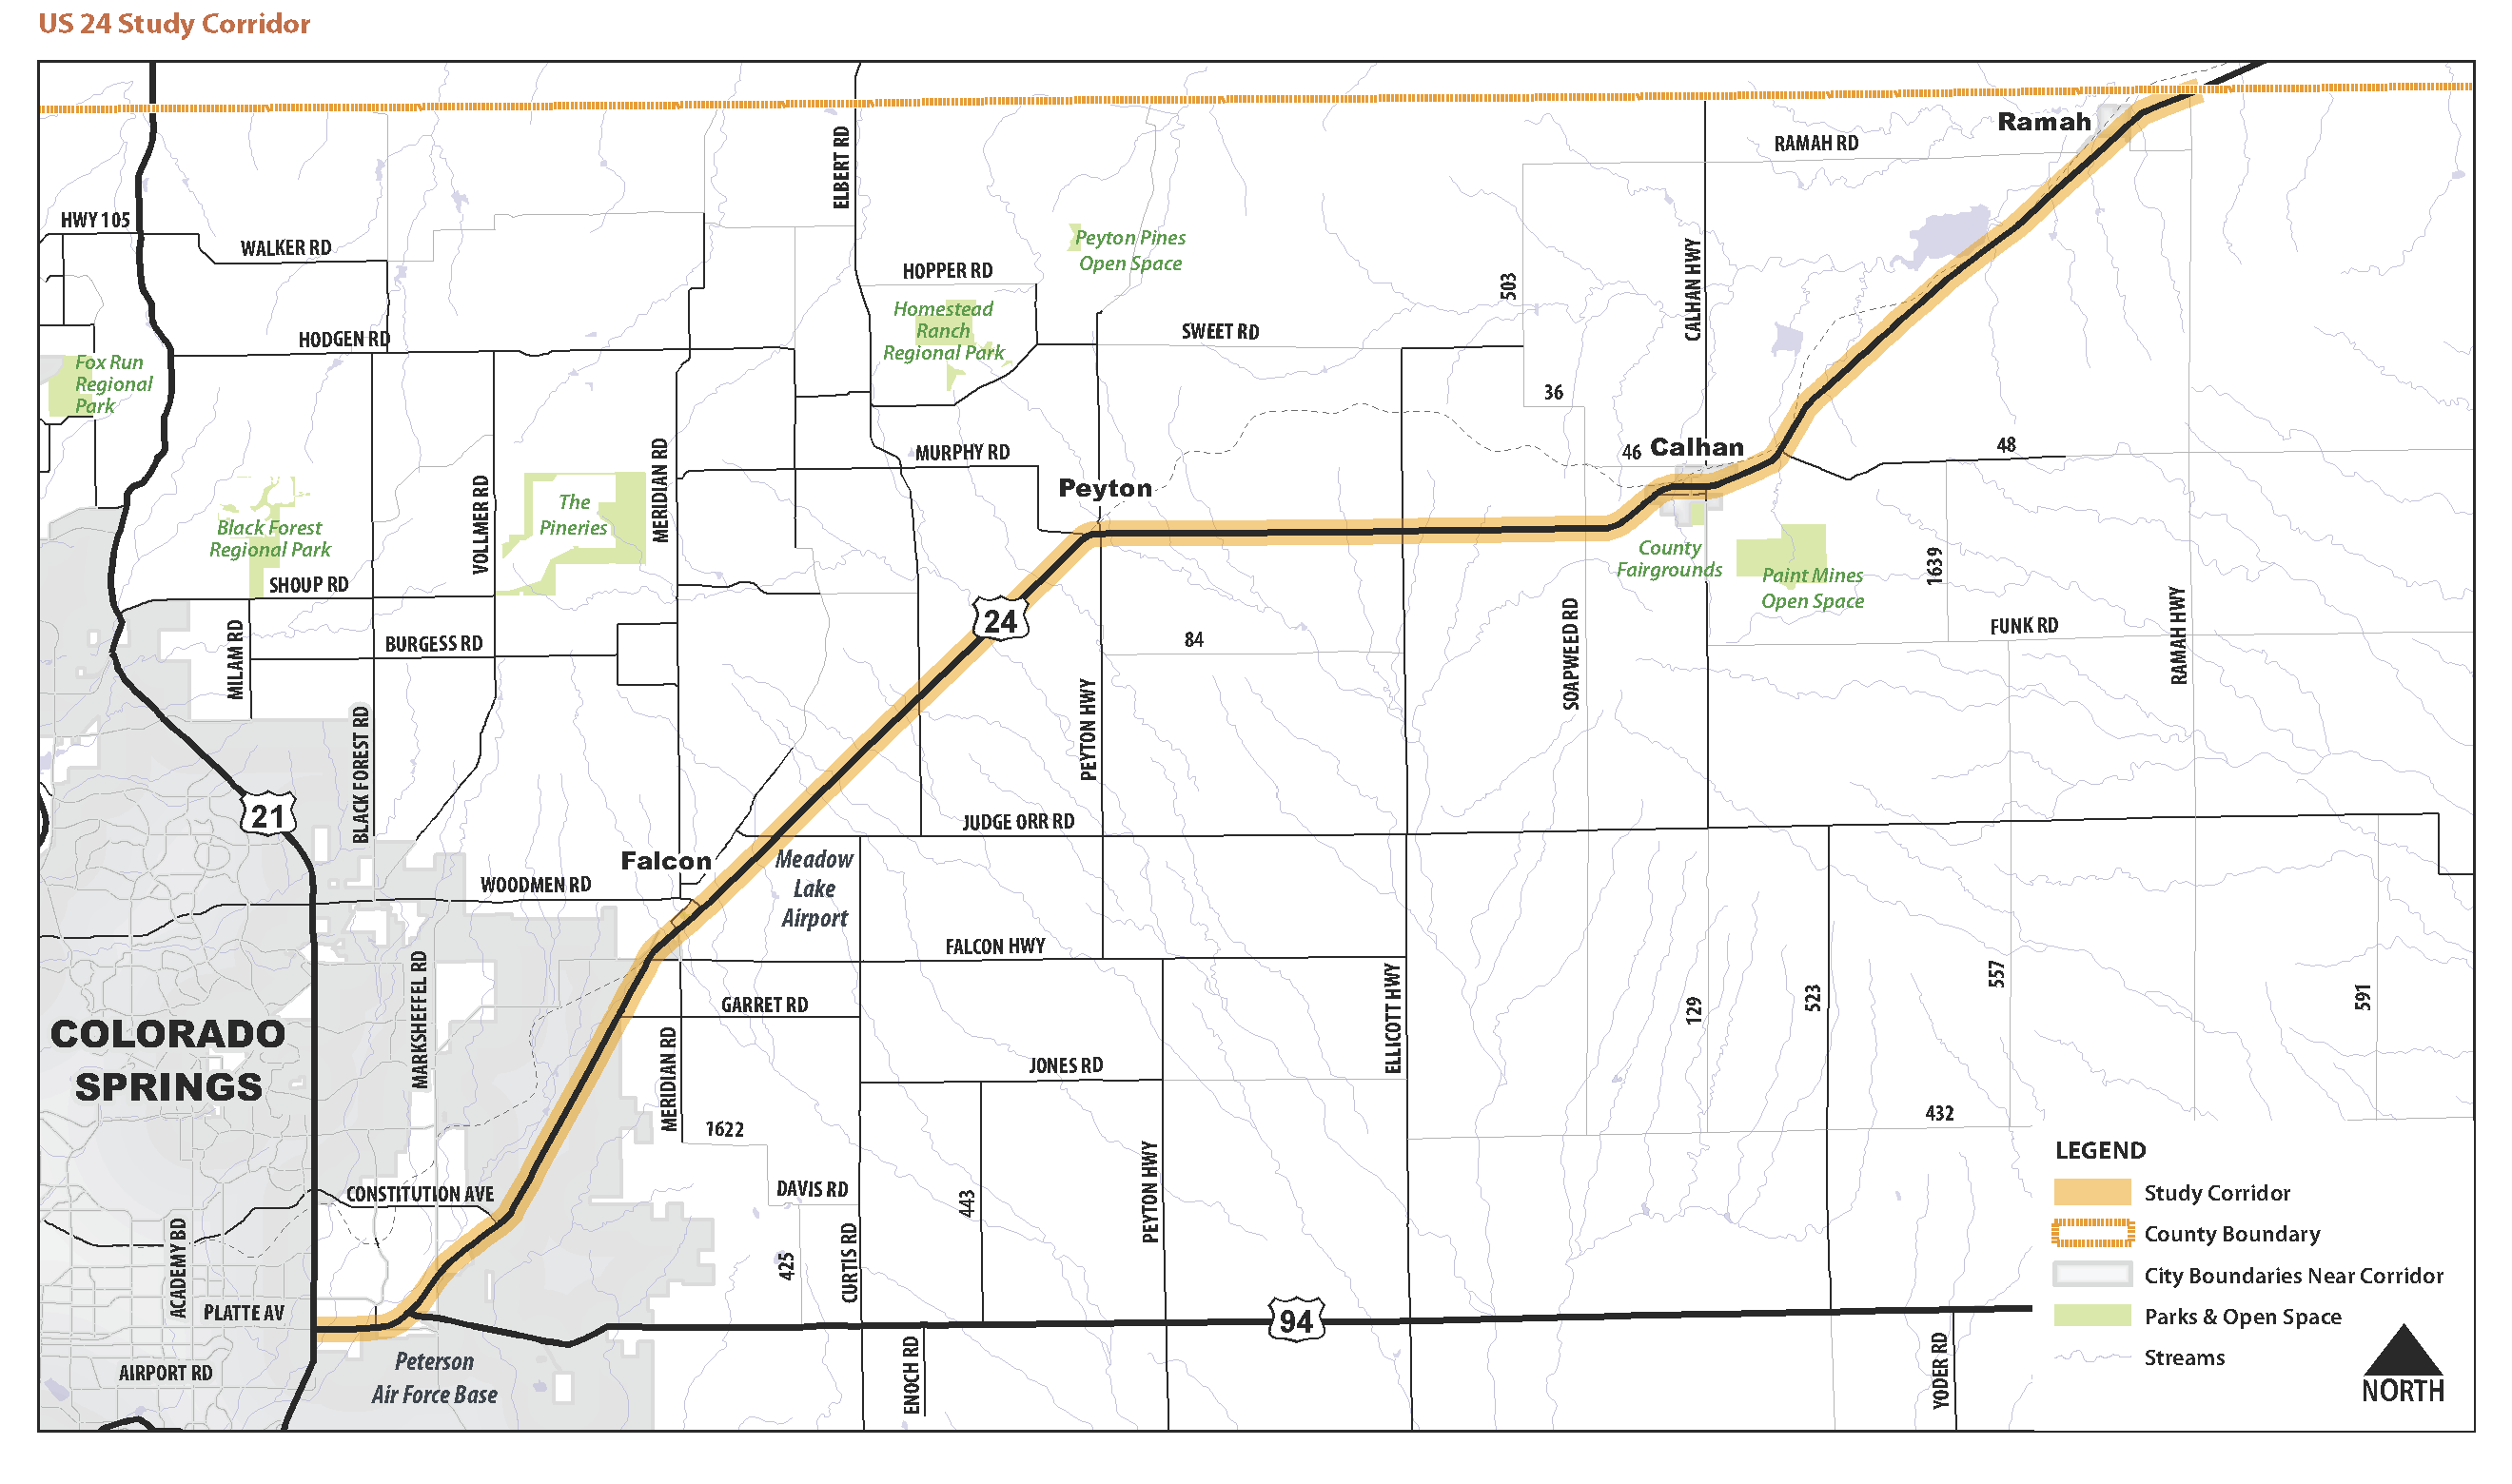 US 24 Study Corridor: May 17, 2016